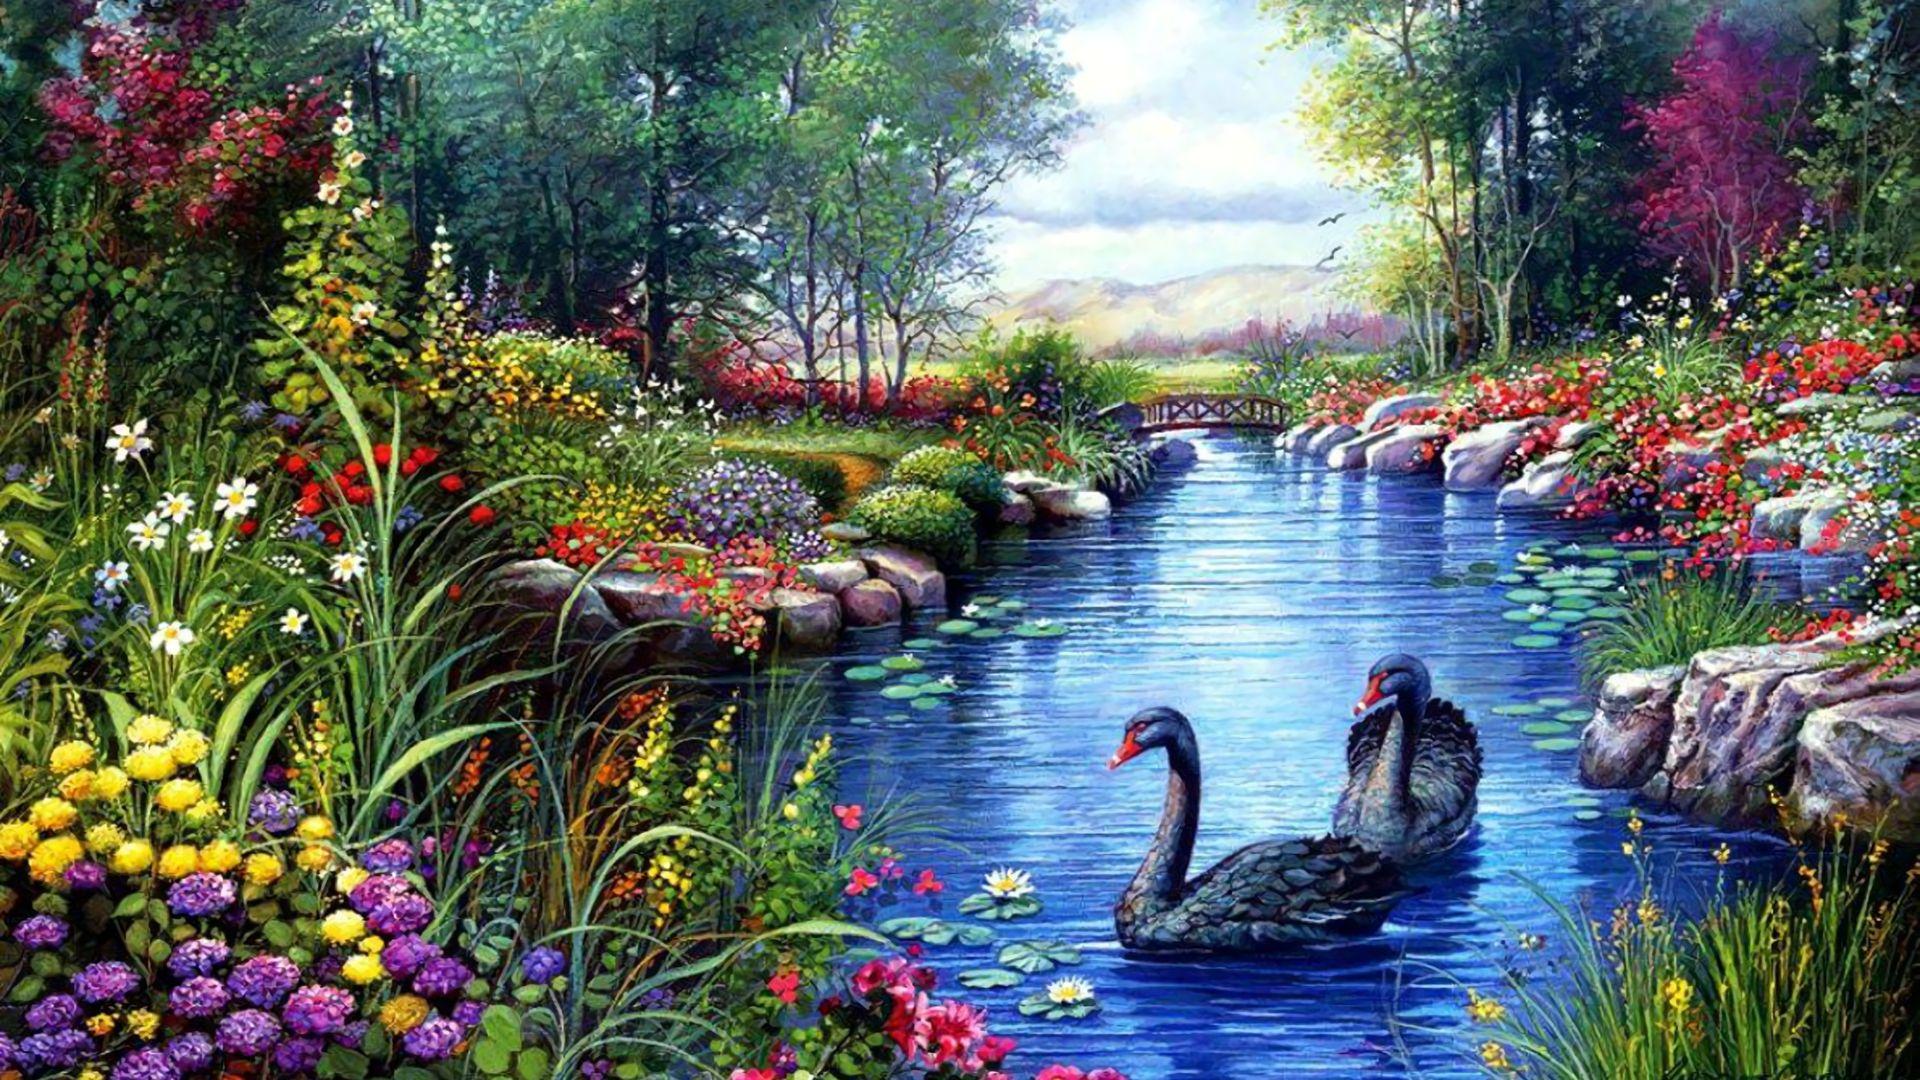 nature wallpaper full hd,natural landscape,swan,black swan,nature,pond